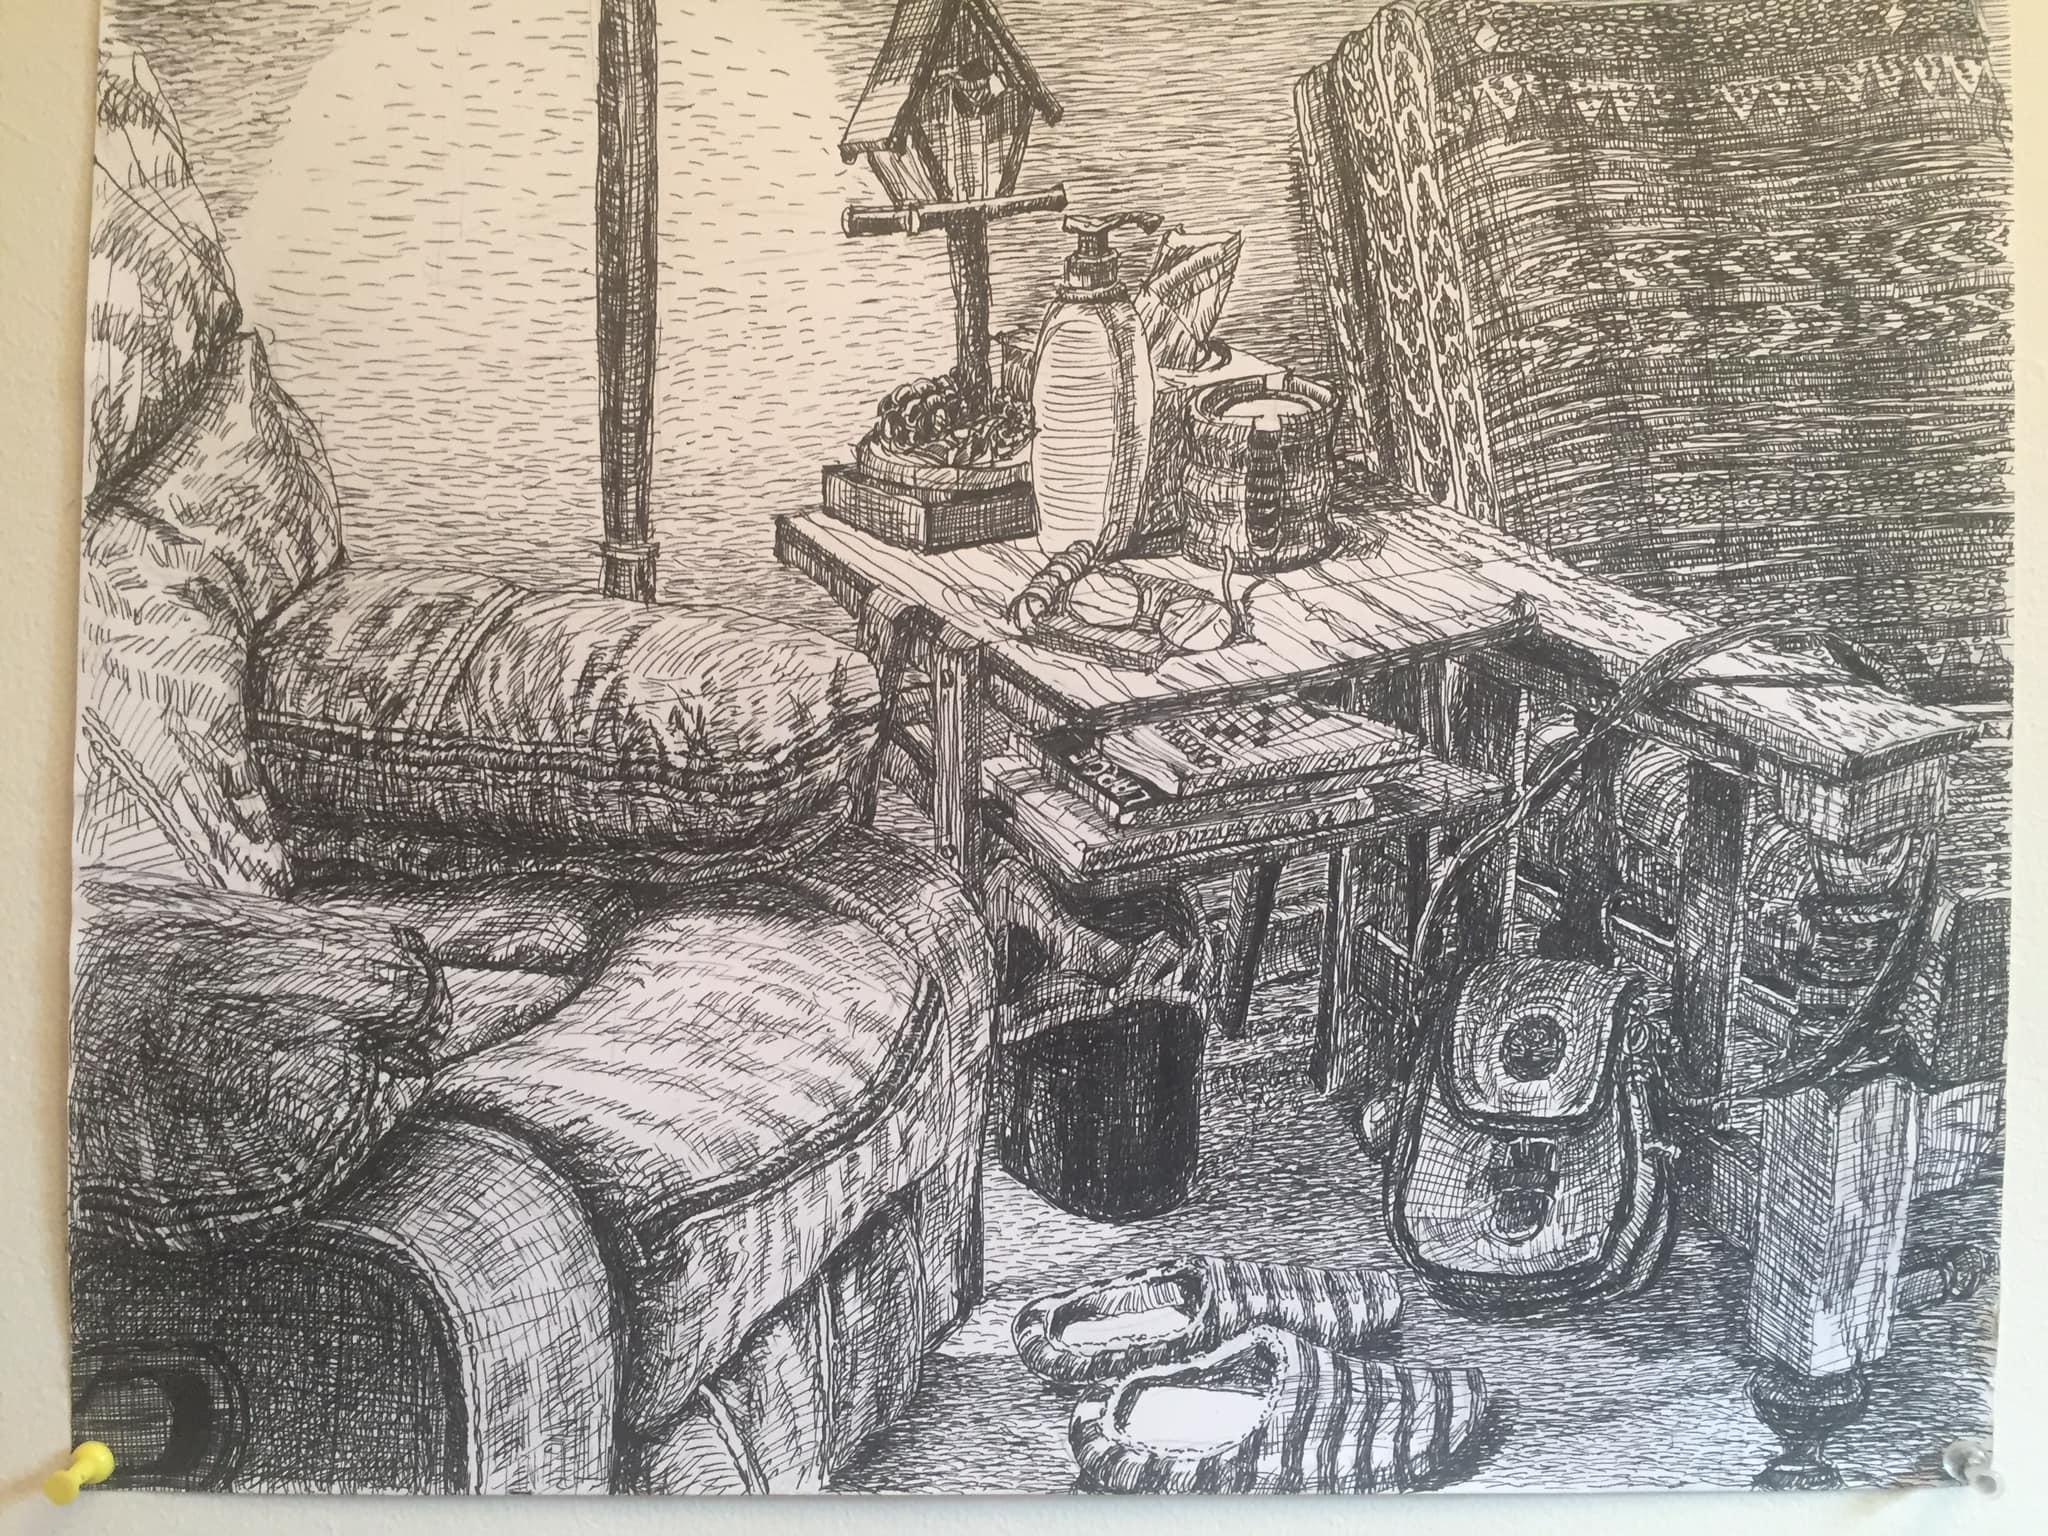 moms-chair---2235-manchester-drive-by-cork-ireland-freelance-artist---art-van-leeuwen